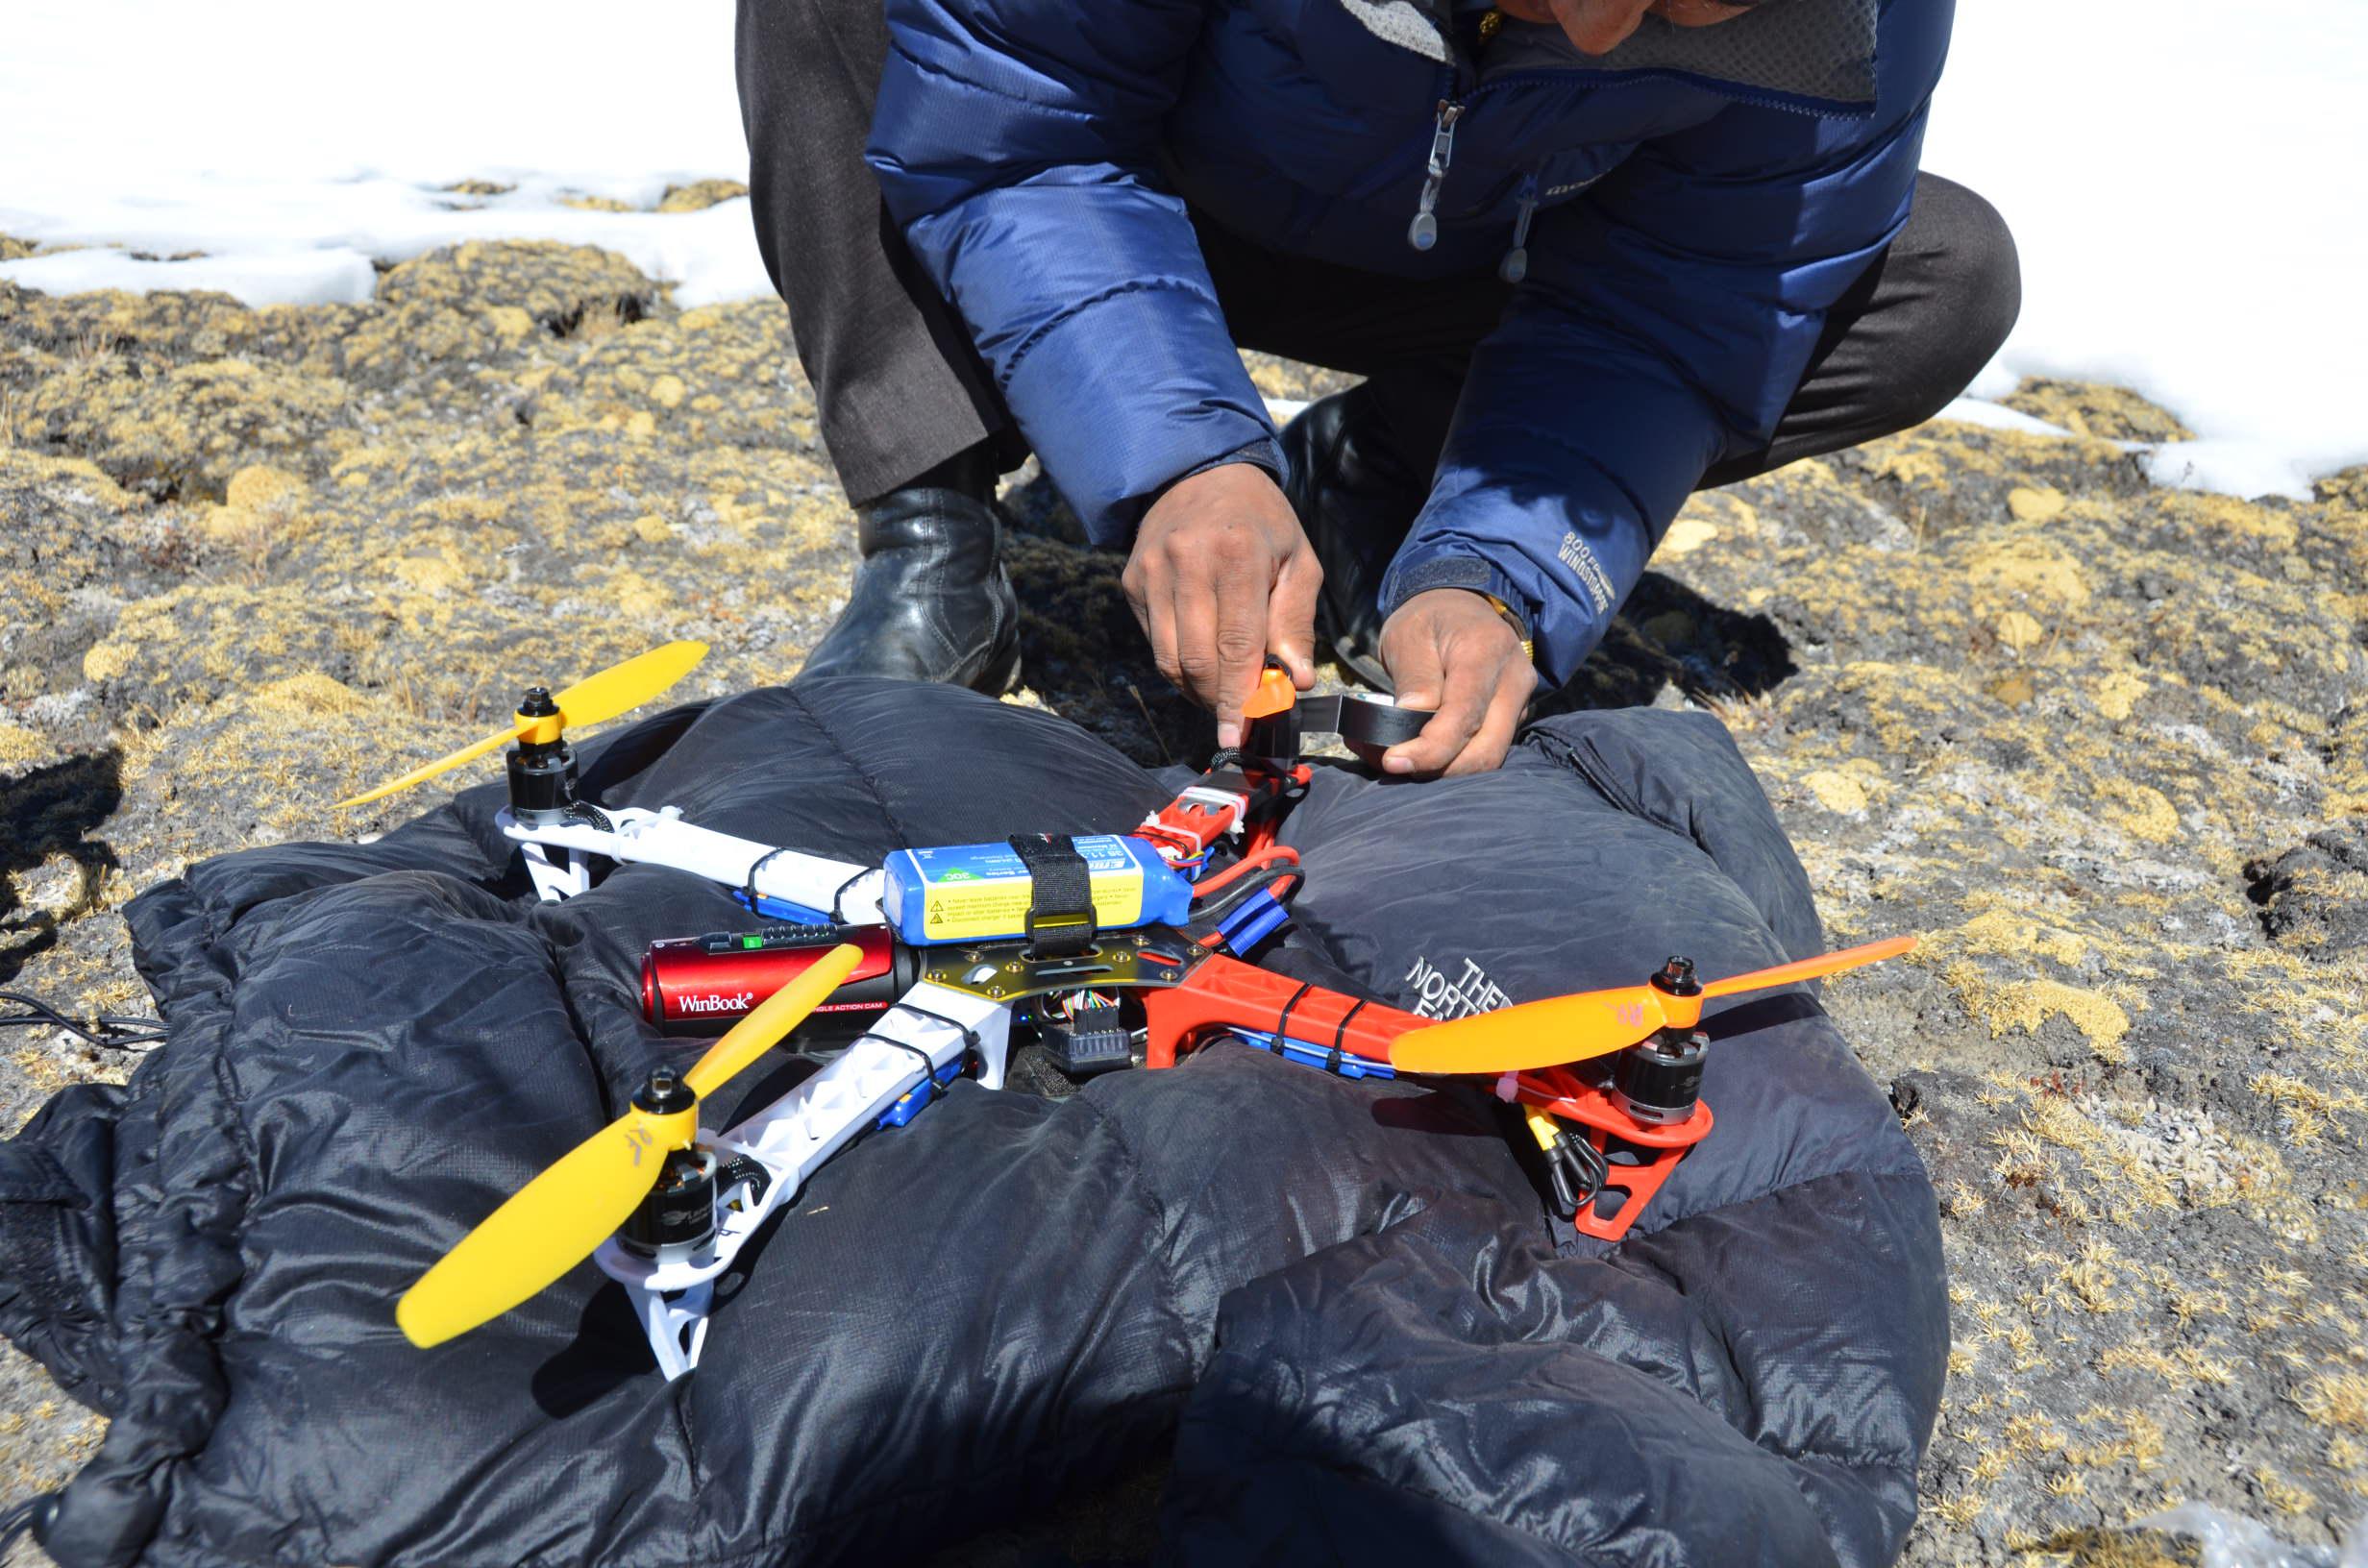 mck-wrk-3-26-15-drone-repair-at-kala-patthar-2015-03-26_00-04-48.jpg